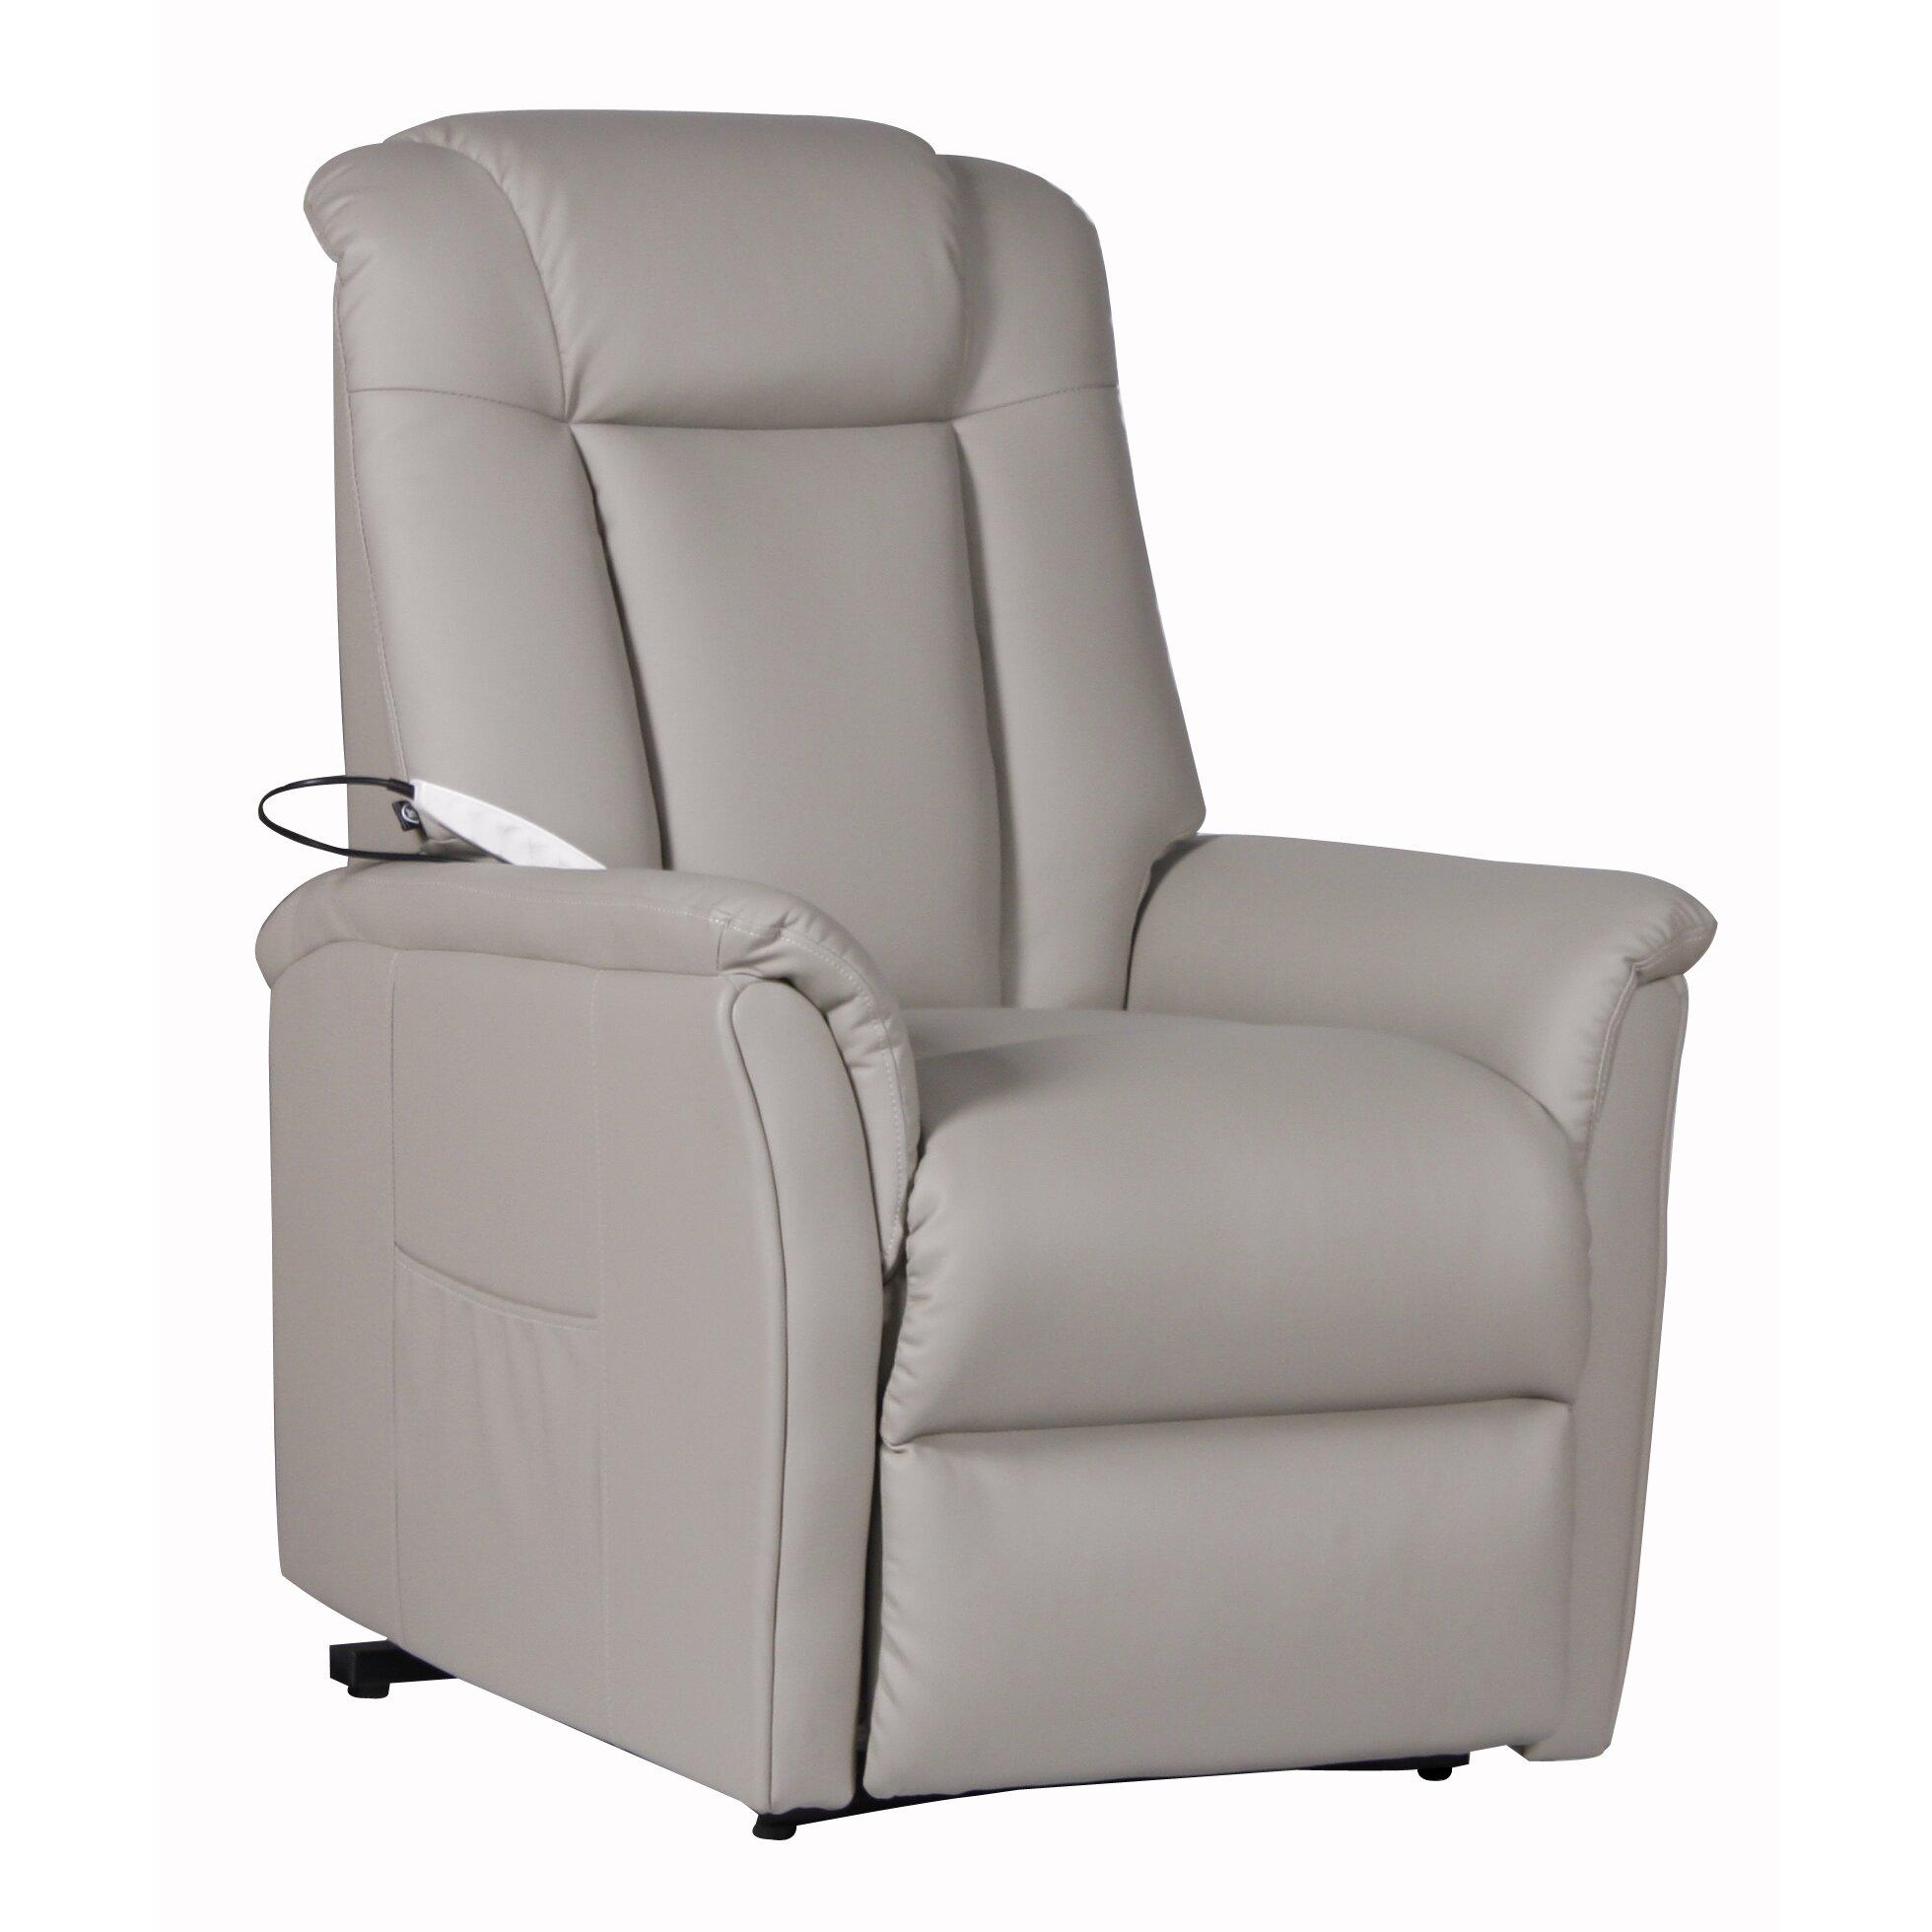 Serta Lift Chairs Infinite Position Lift ChairReviewsWayfair